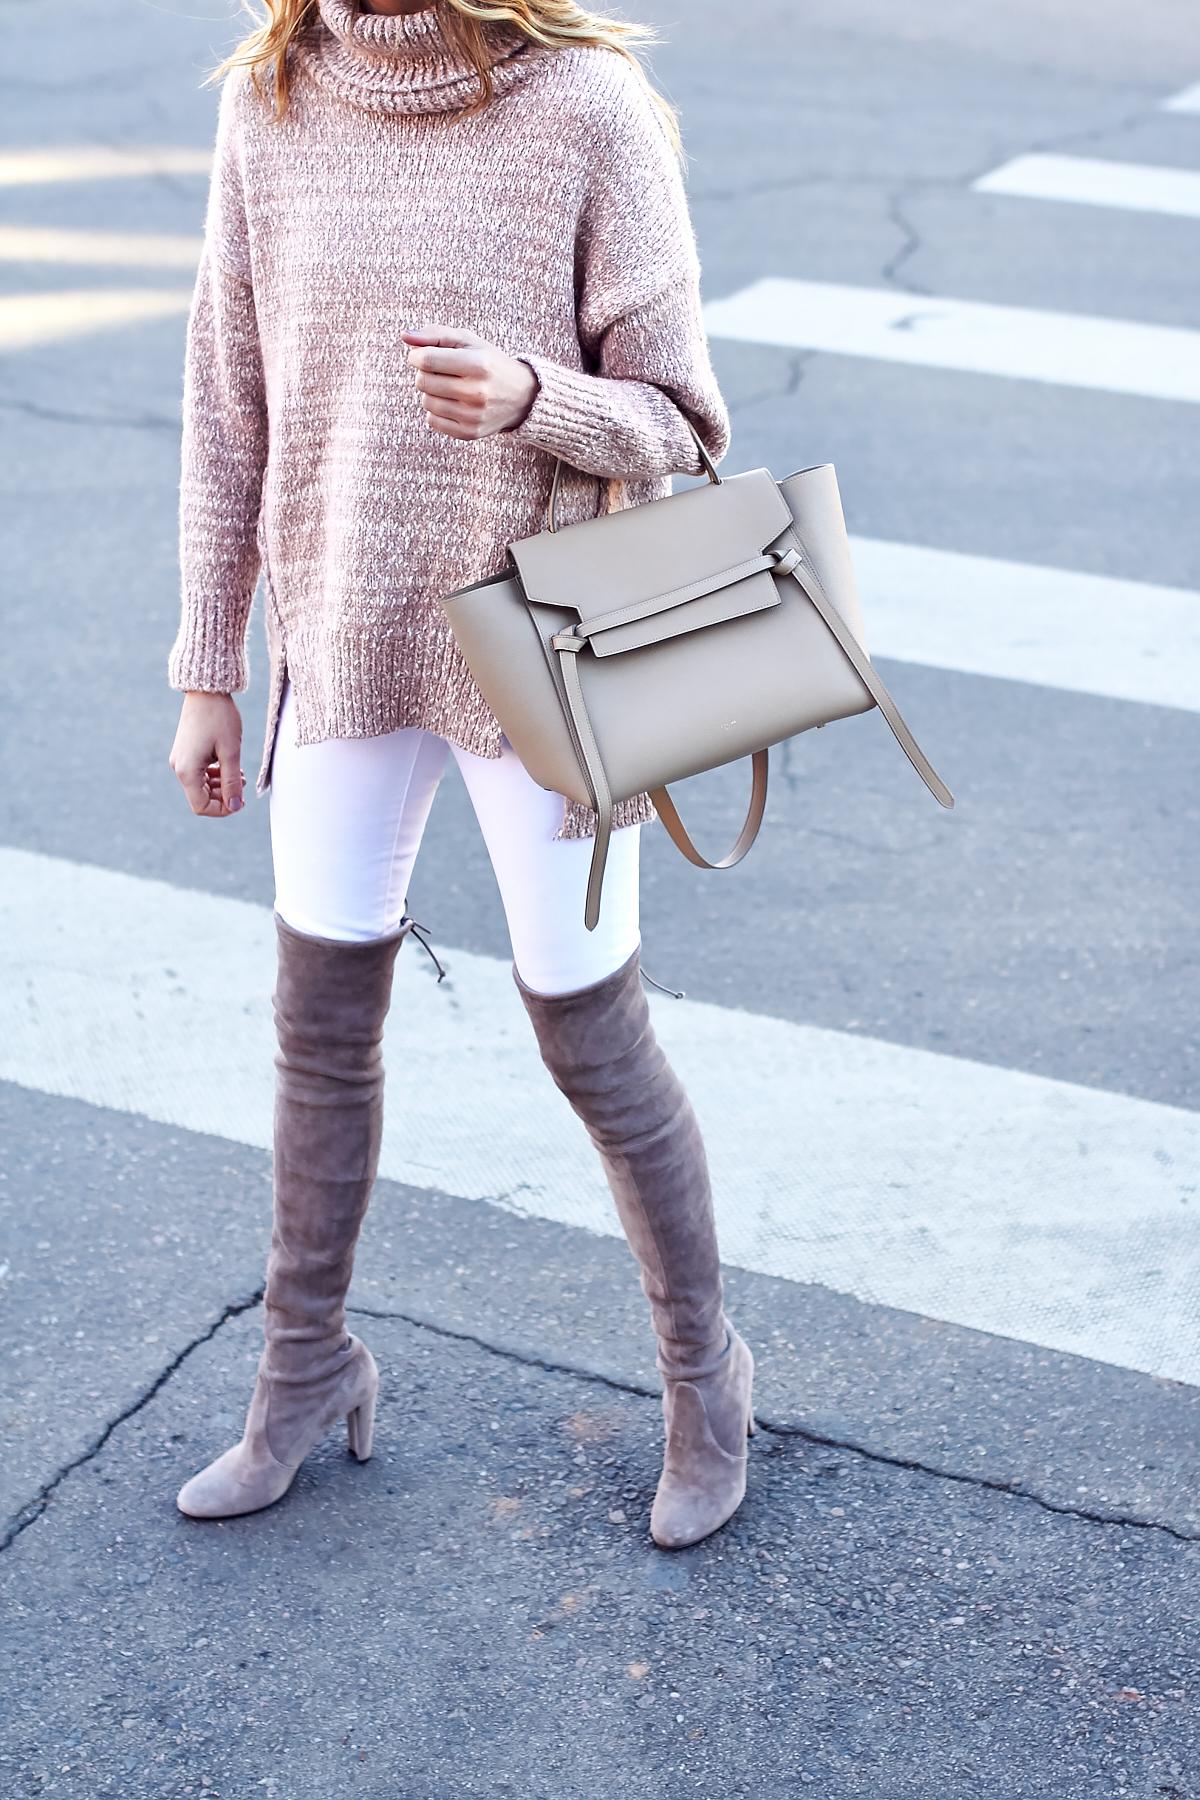 Winter Outfit, Stuart Weitzman Over the Knee Boots, Celine Tie Belt Bag, Blush Turtleneck Sweater